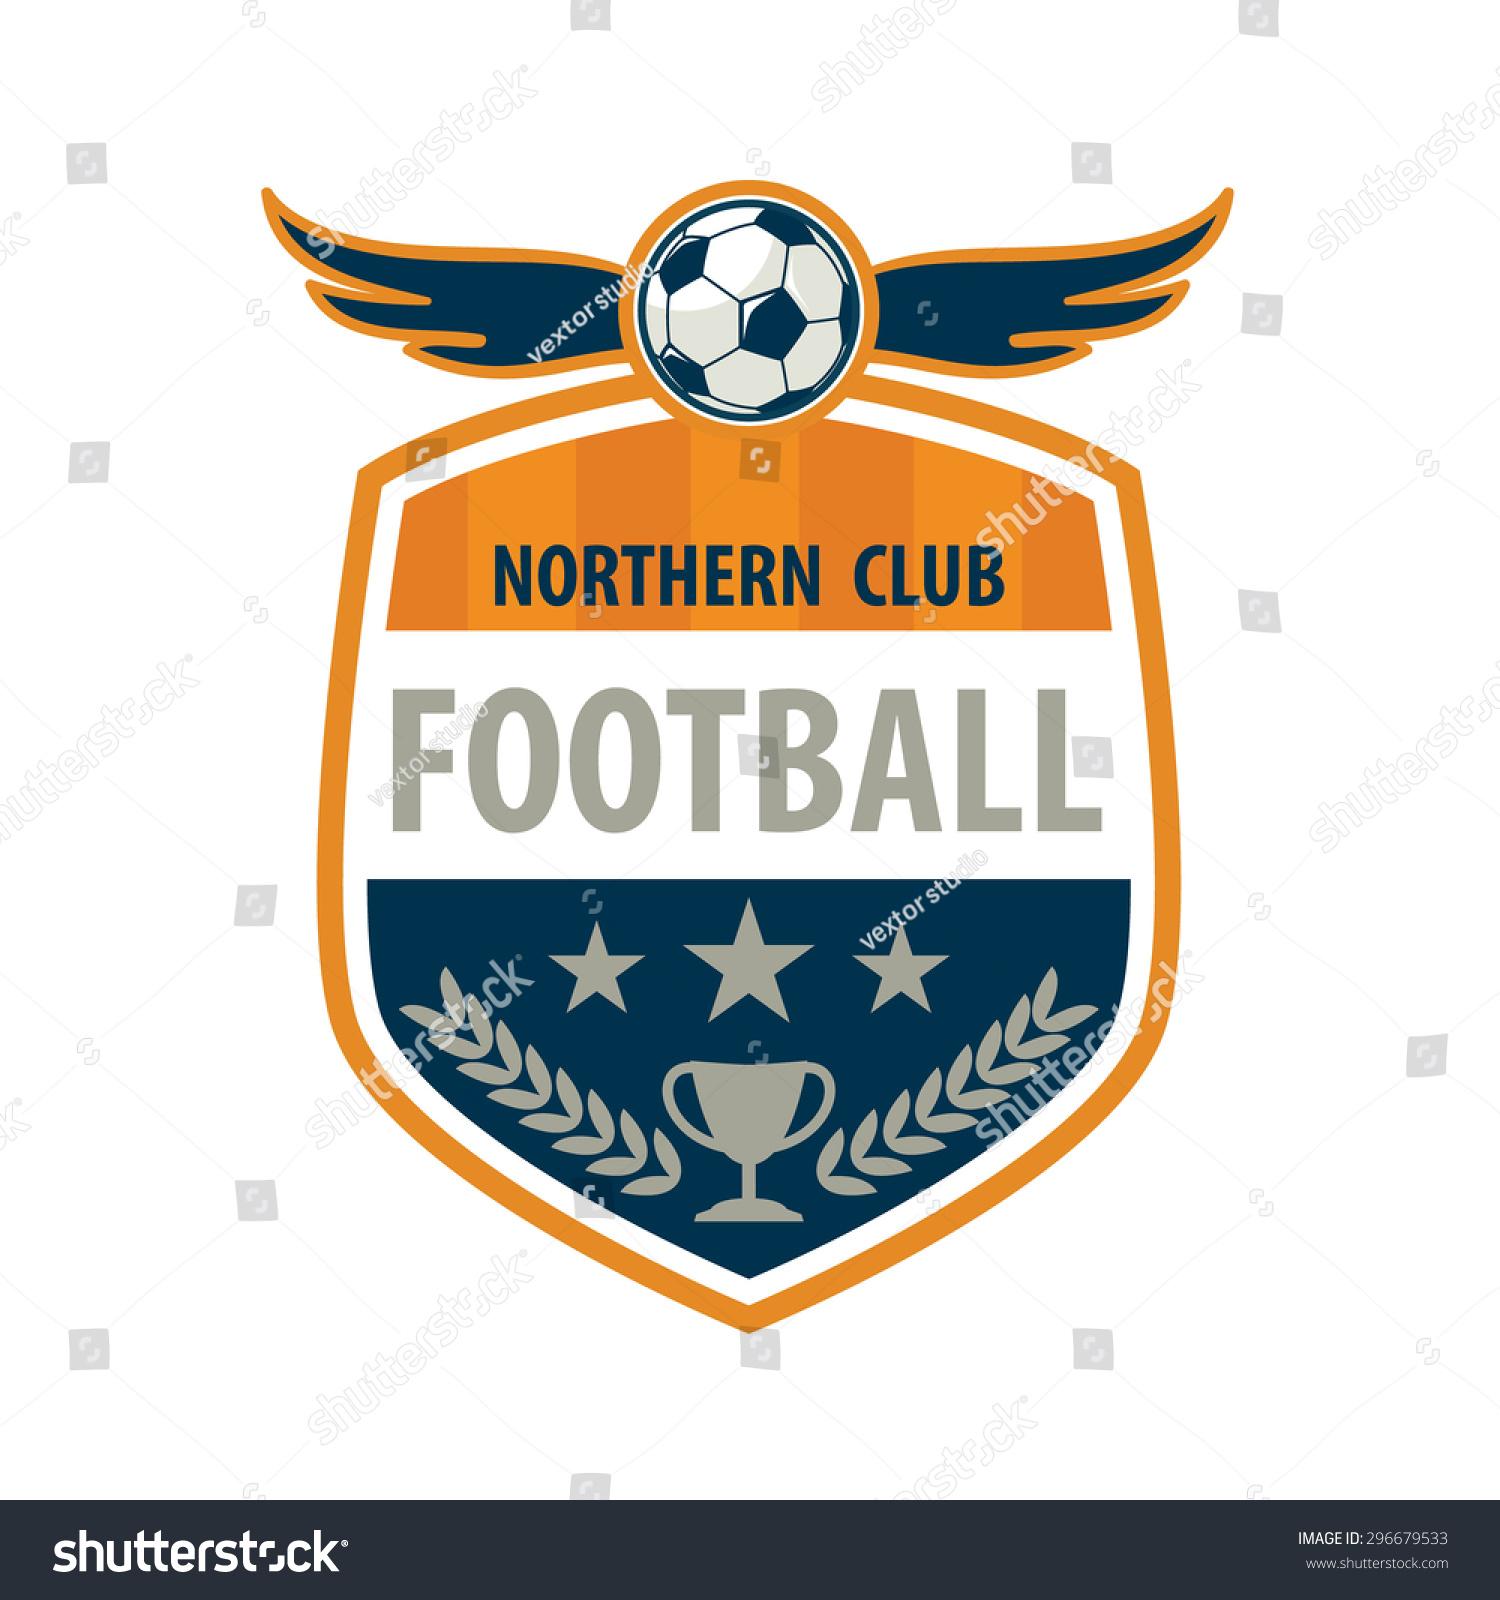 Soccer Logo Templates Related Keywords u0026 Suggestions - Soccer Logo ...